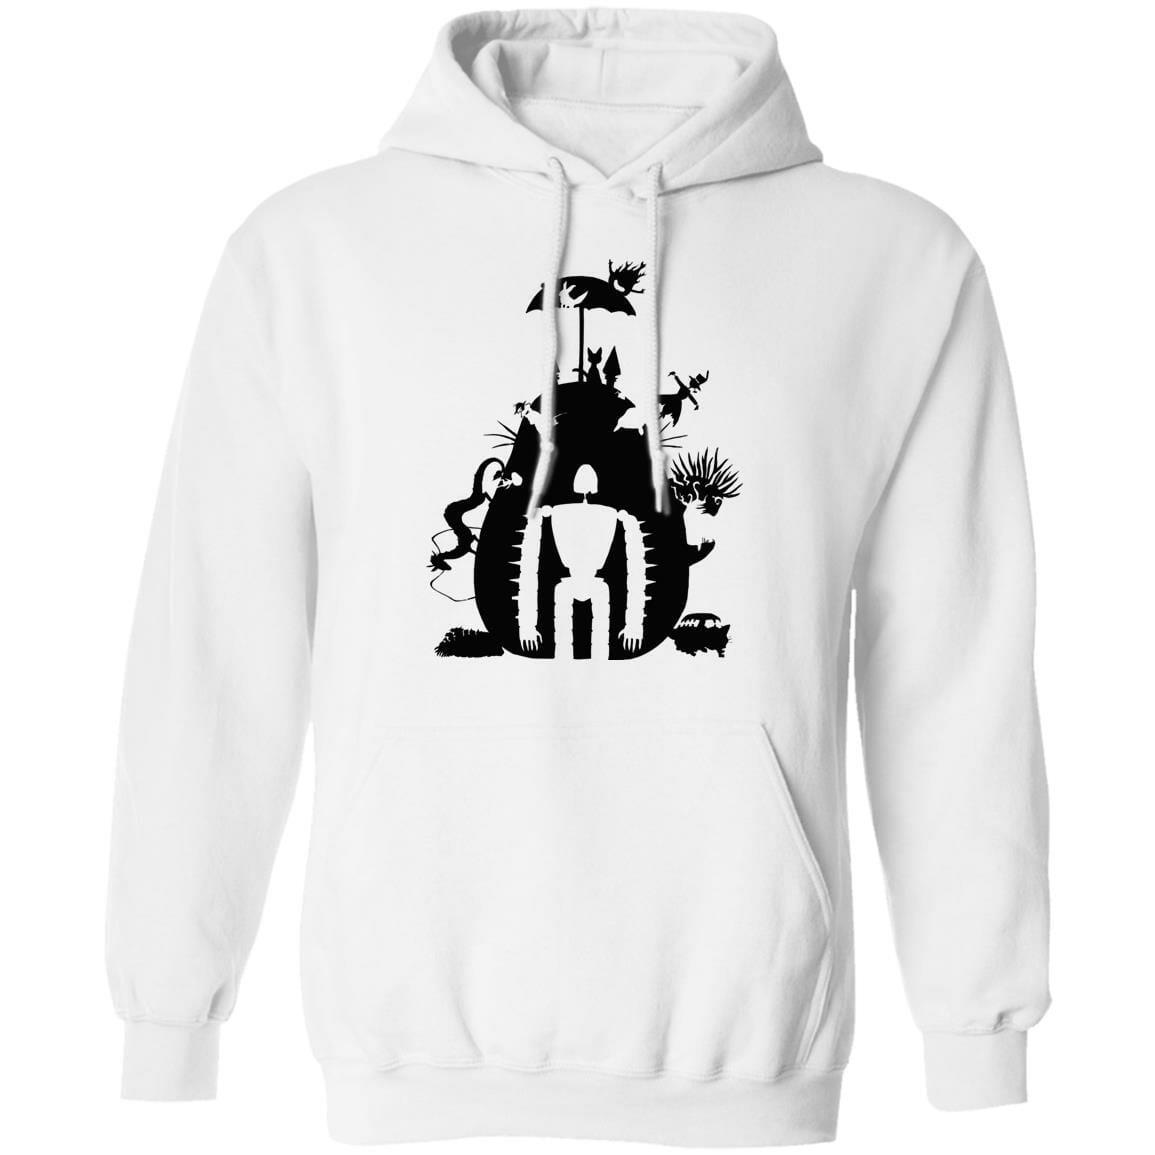 Studio Ghibli Black & White Art Compilation Hoodie Unisex